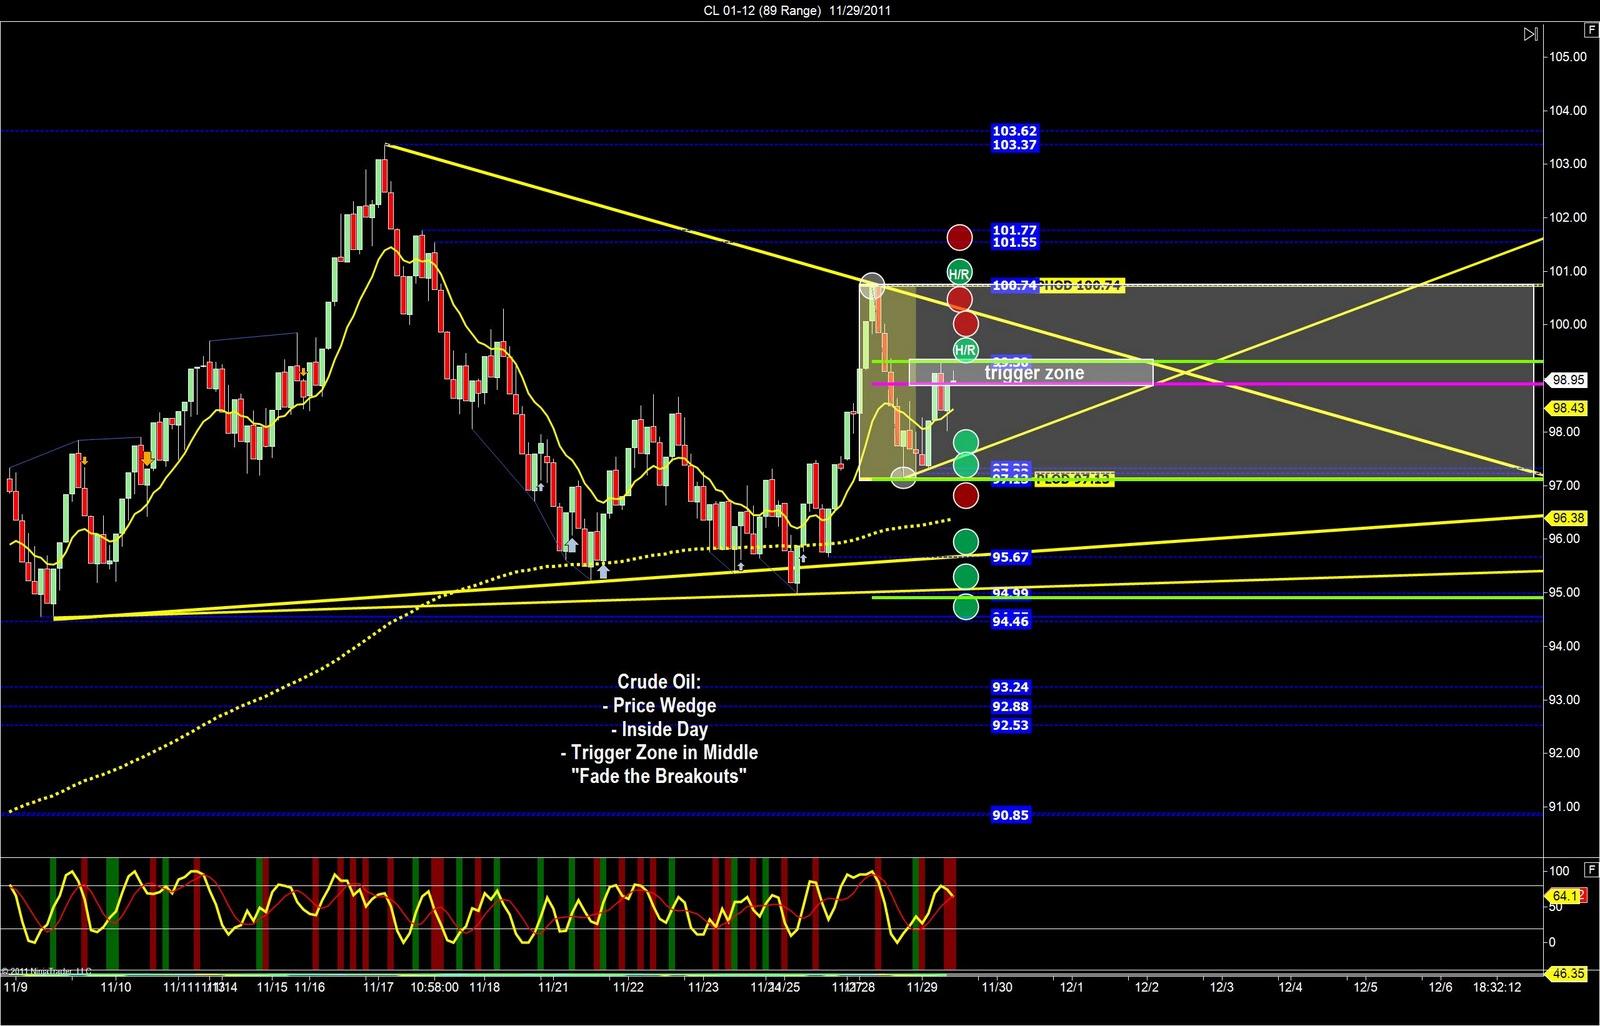 Eurodollar futures trading strategies